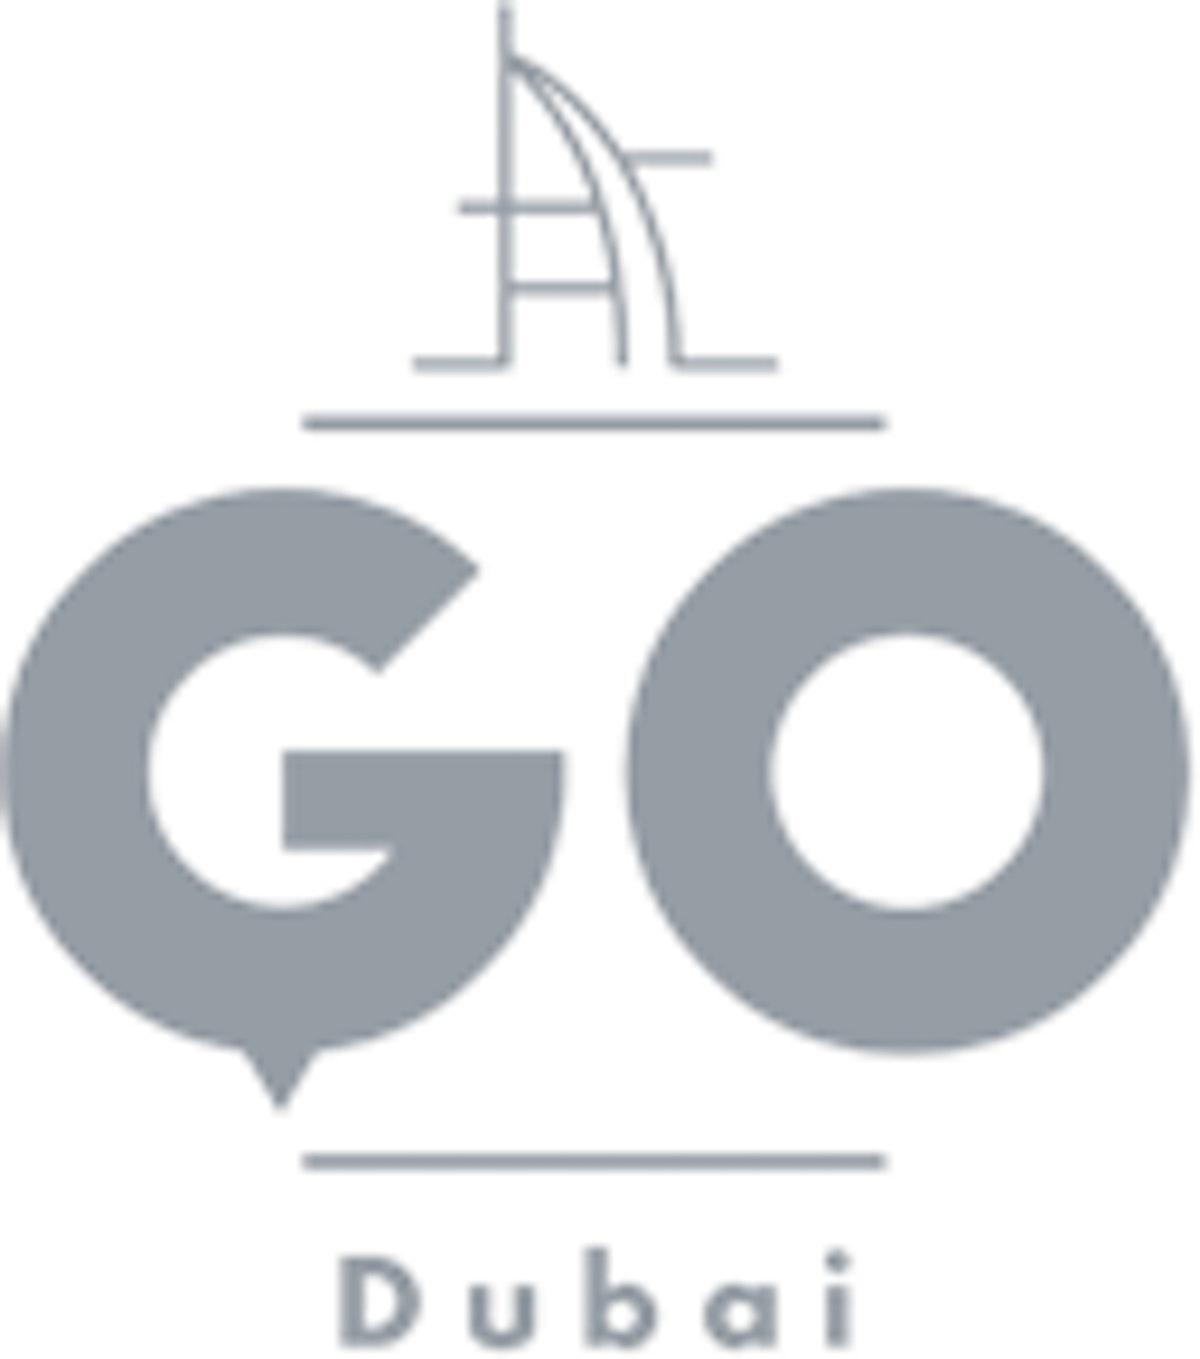 godubai-logo1.png